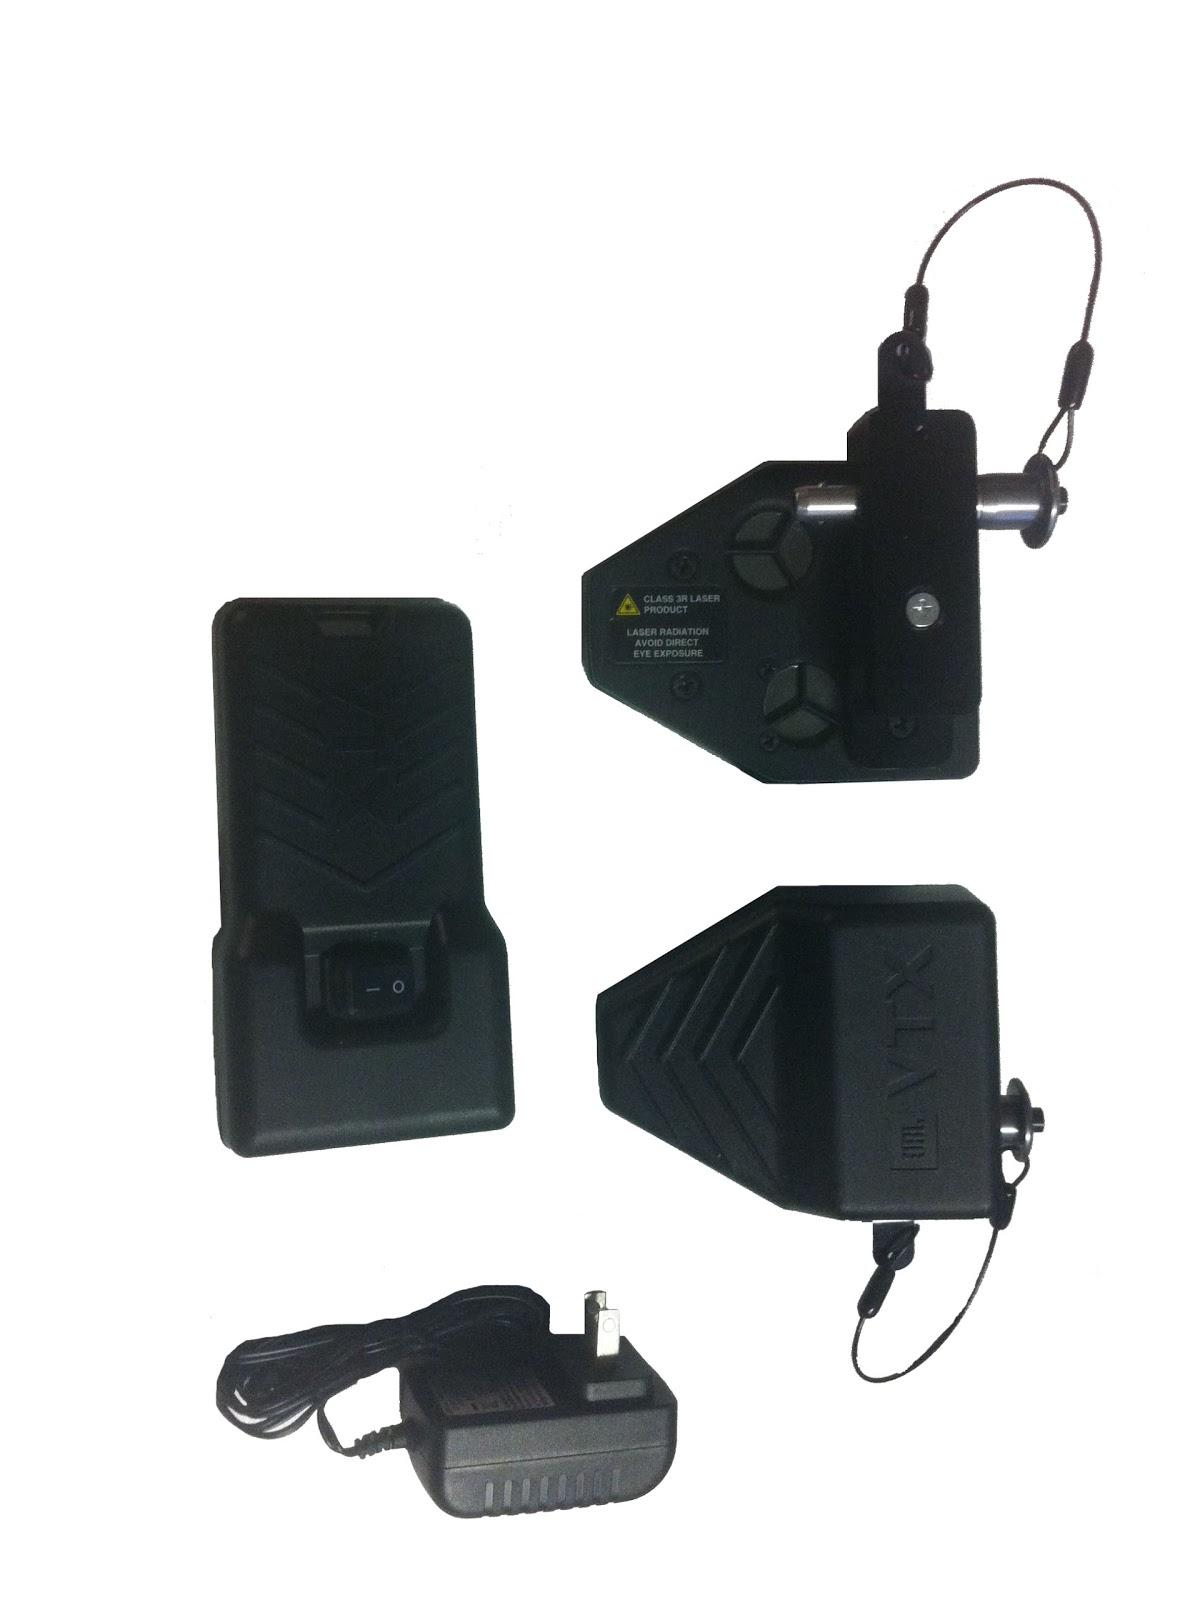 JBL Laser Accessory Kit